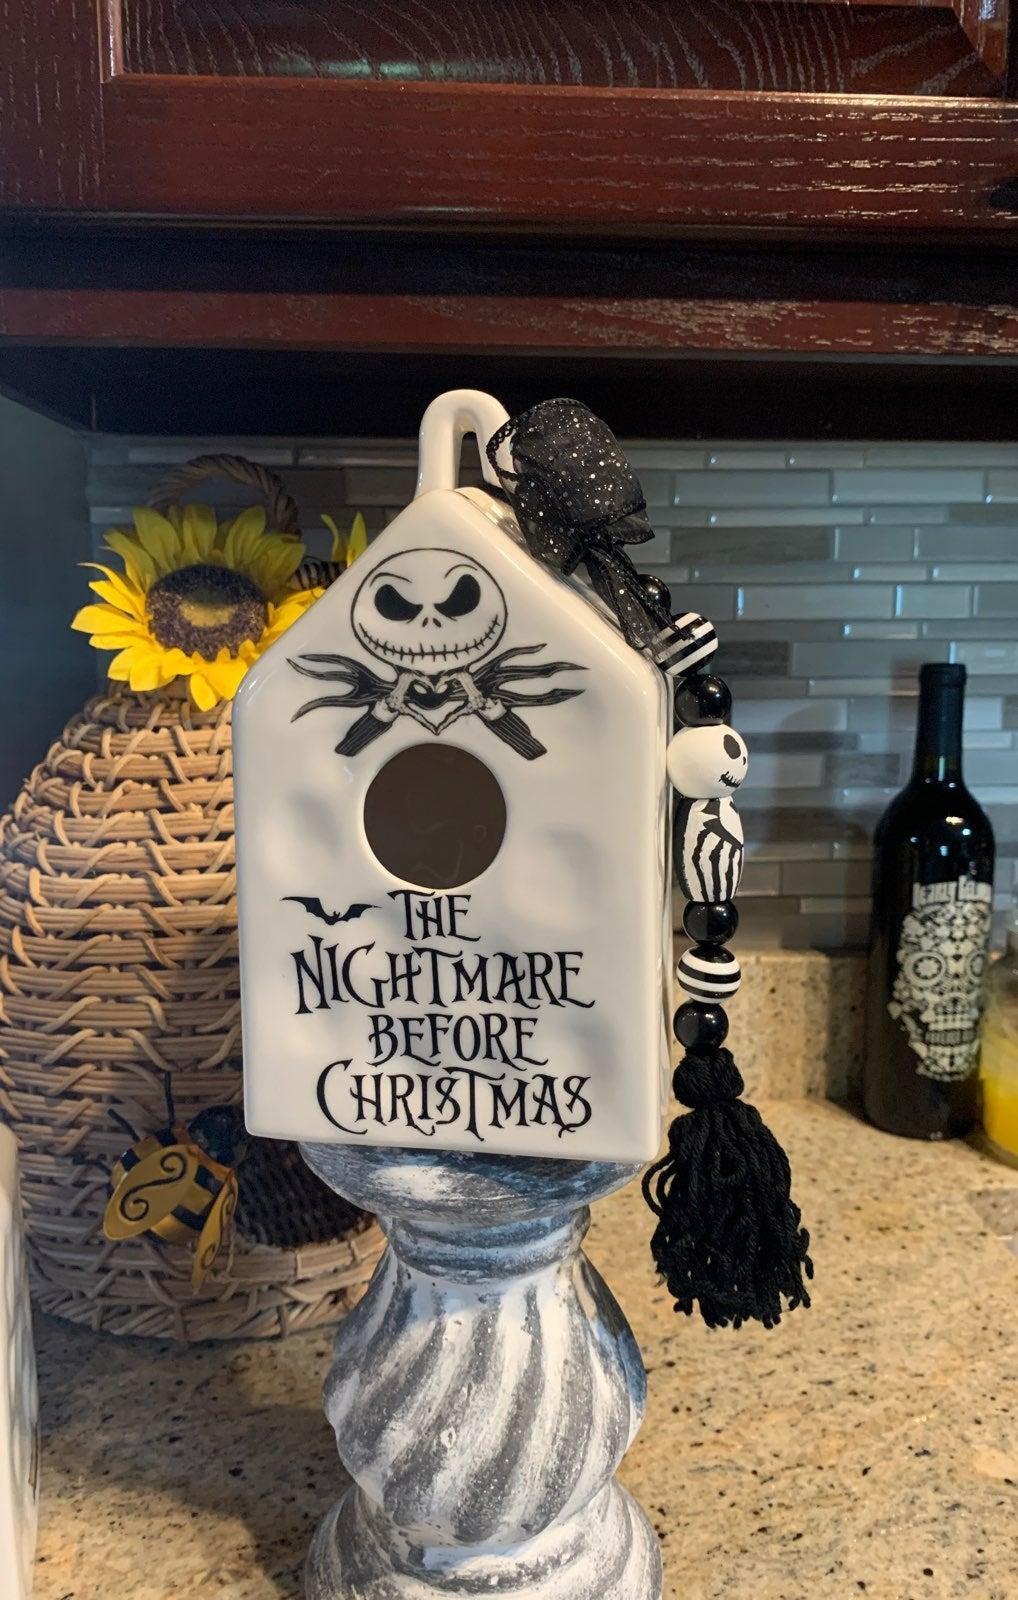 The Nightmare Before Christmas birdhouse